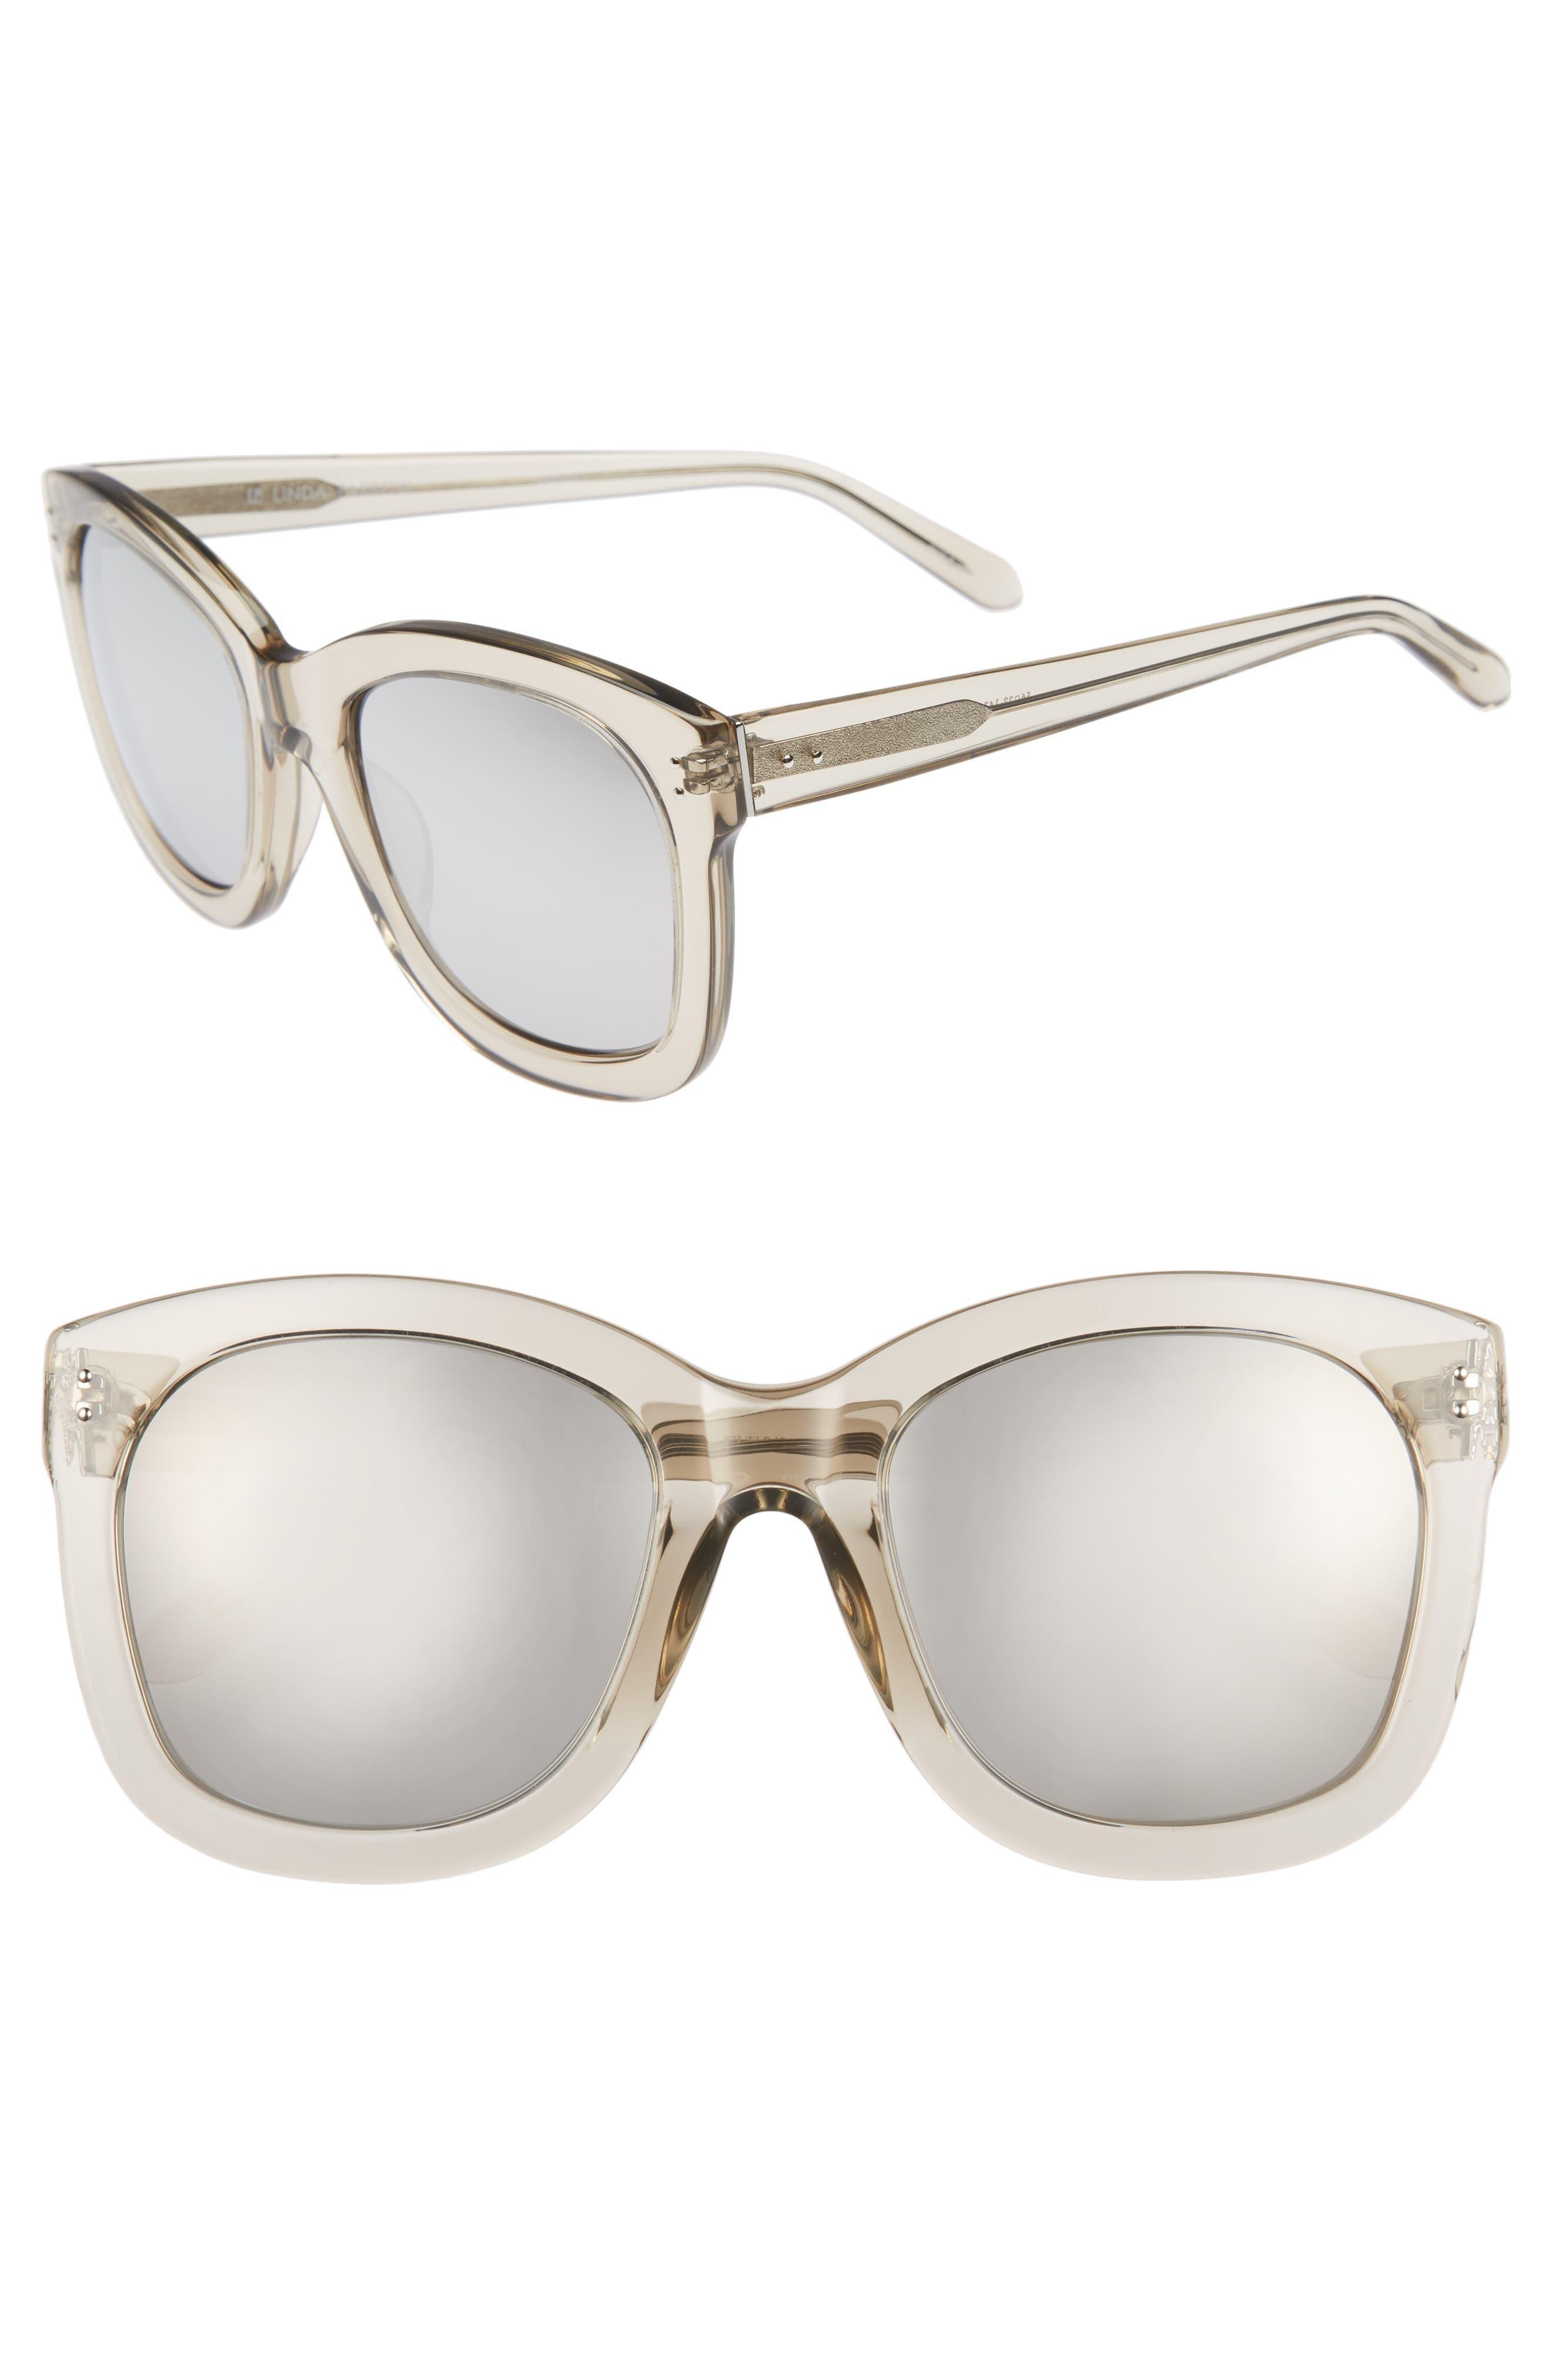 Alternate Image 1 Selected - Linda Farrow 56mm Mirrored Sunglasses